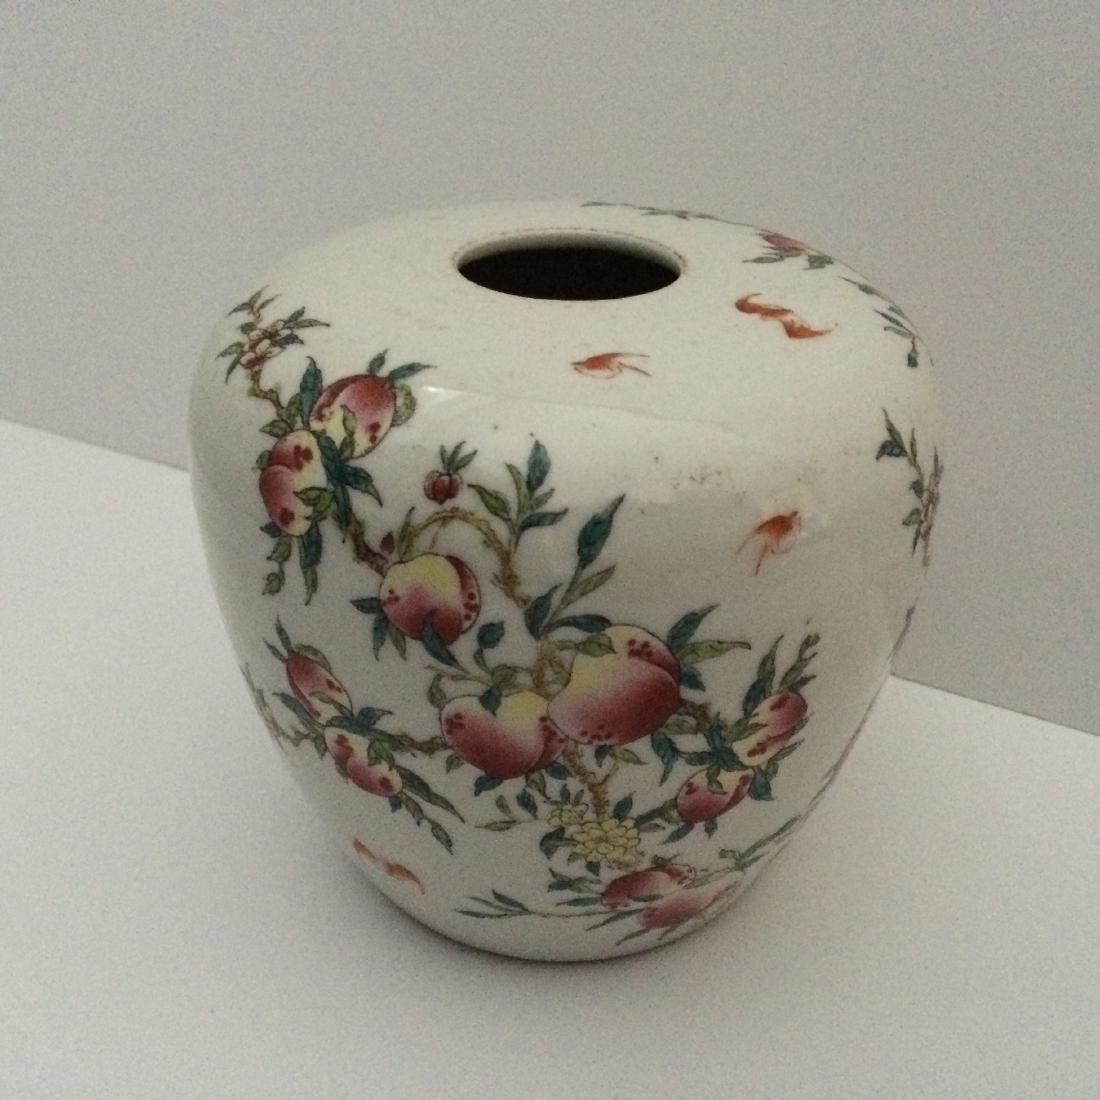 "Chinese Antique Jar, Peaches/Bats, (4.5""H)"